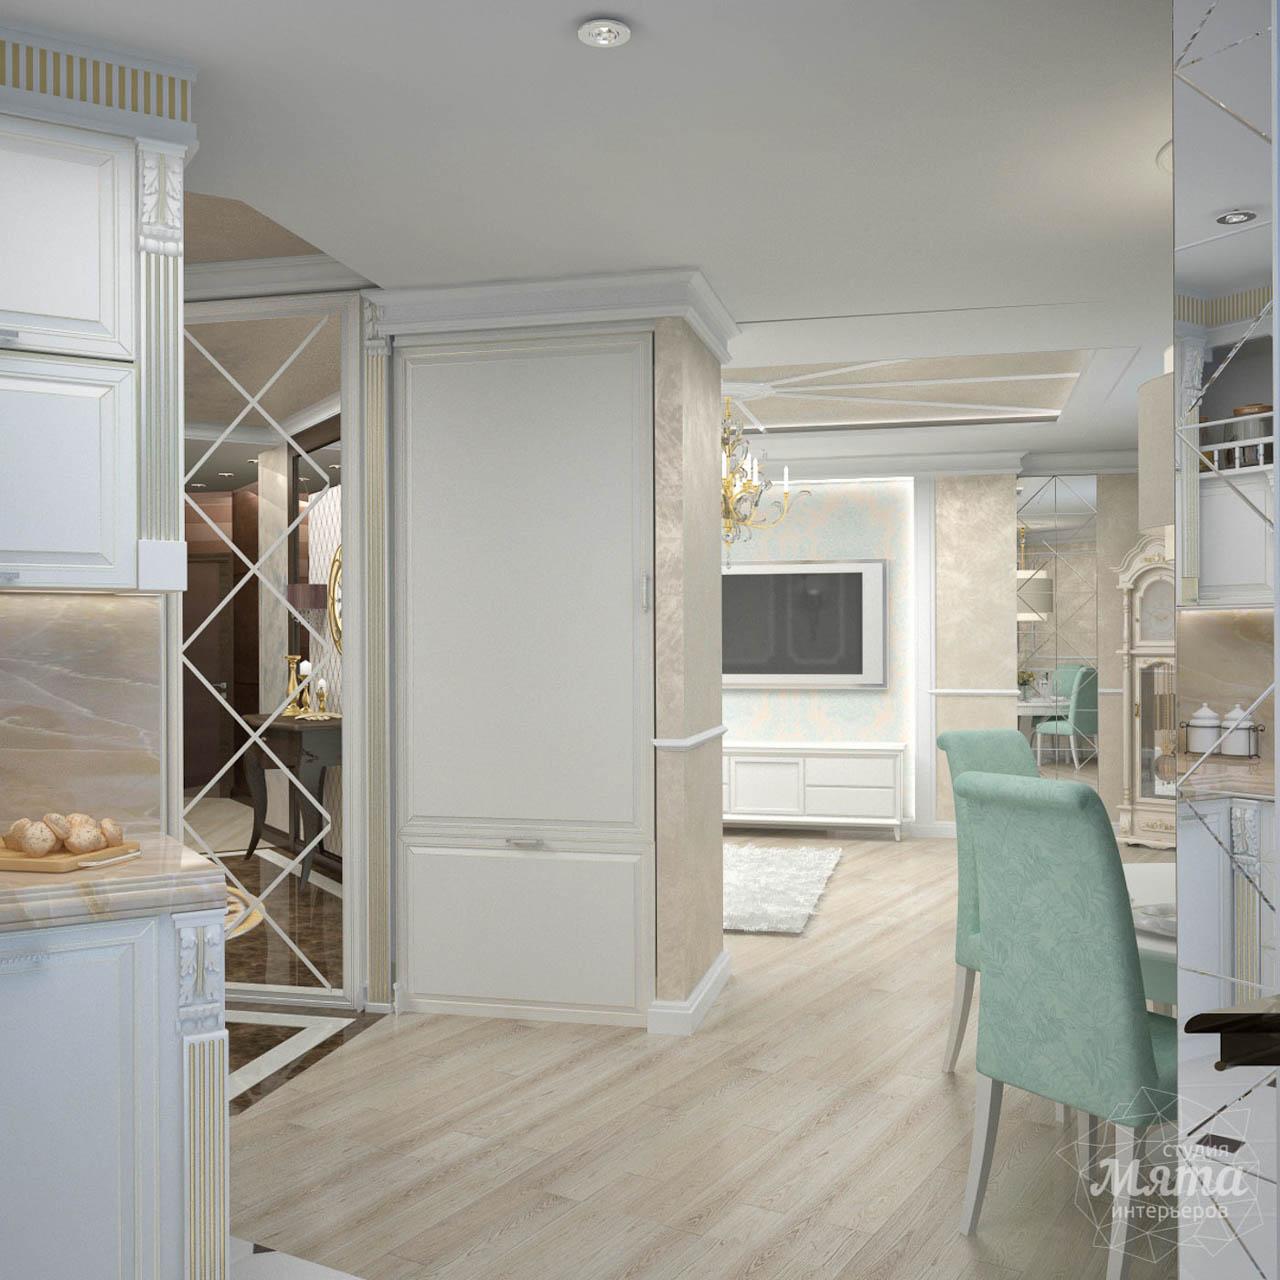 Дизайн интерьера и ремонт трехкомнатной квартиры по ул. 8 Марта 190 img1470635467